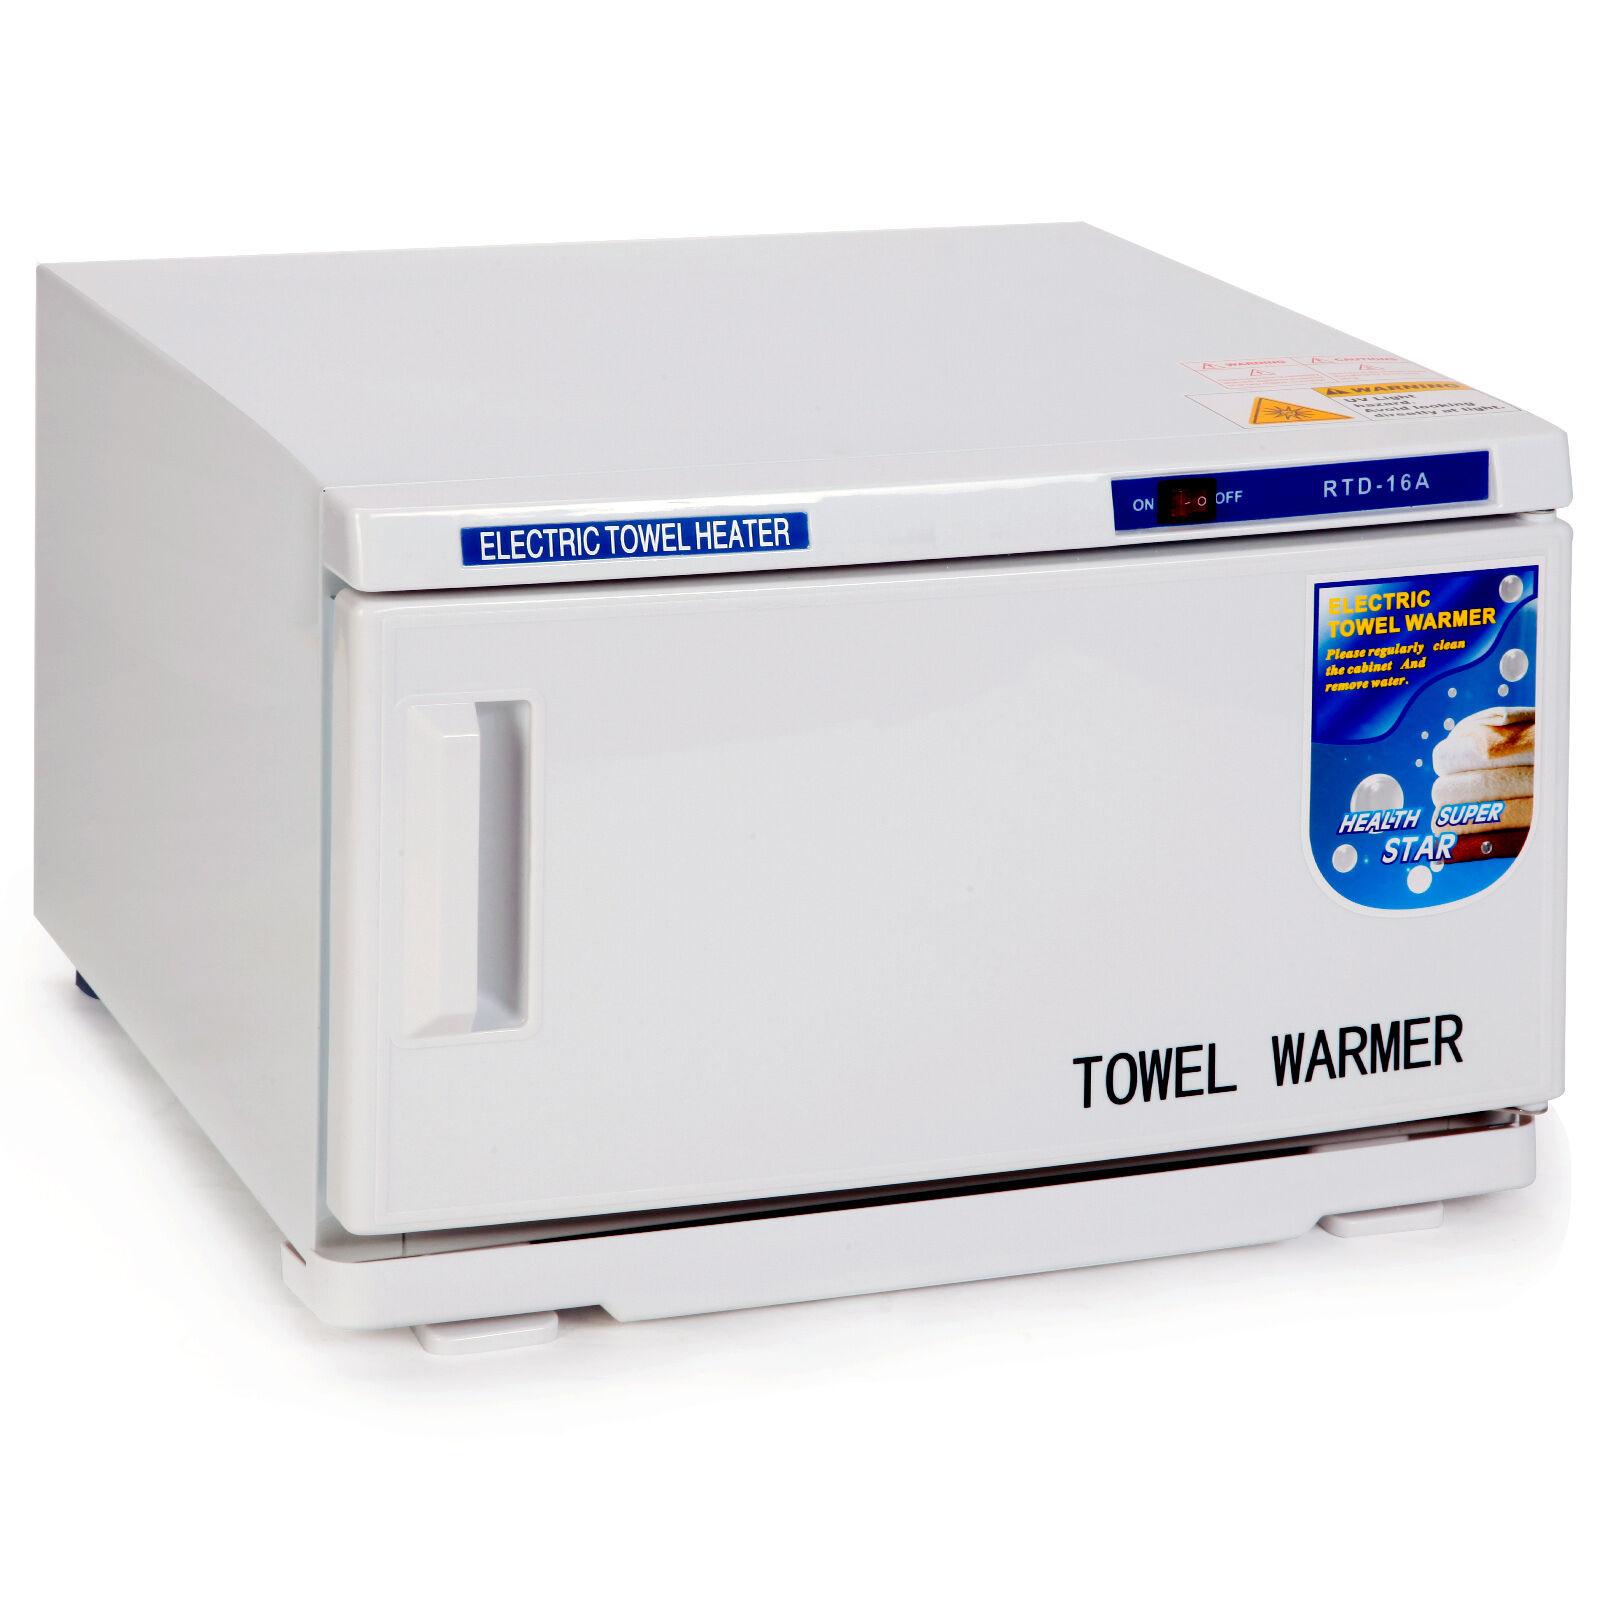 2 in 1 hot towel warmer cabinet 16l uv sterilizer salon spa beauty rh ebay com Professional Towel Warmers Cabinets spa towel warmer cabinets on sale